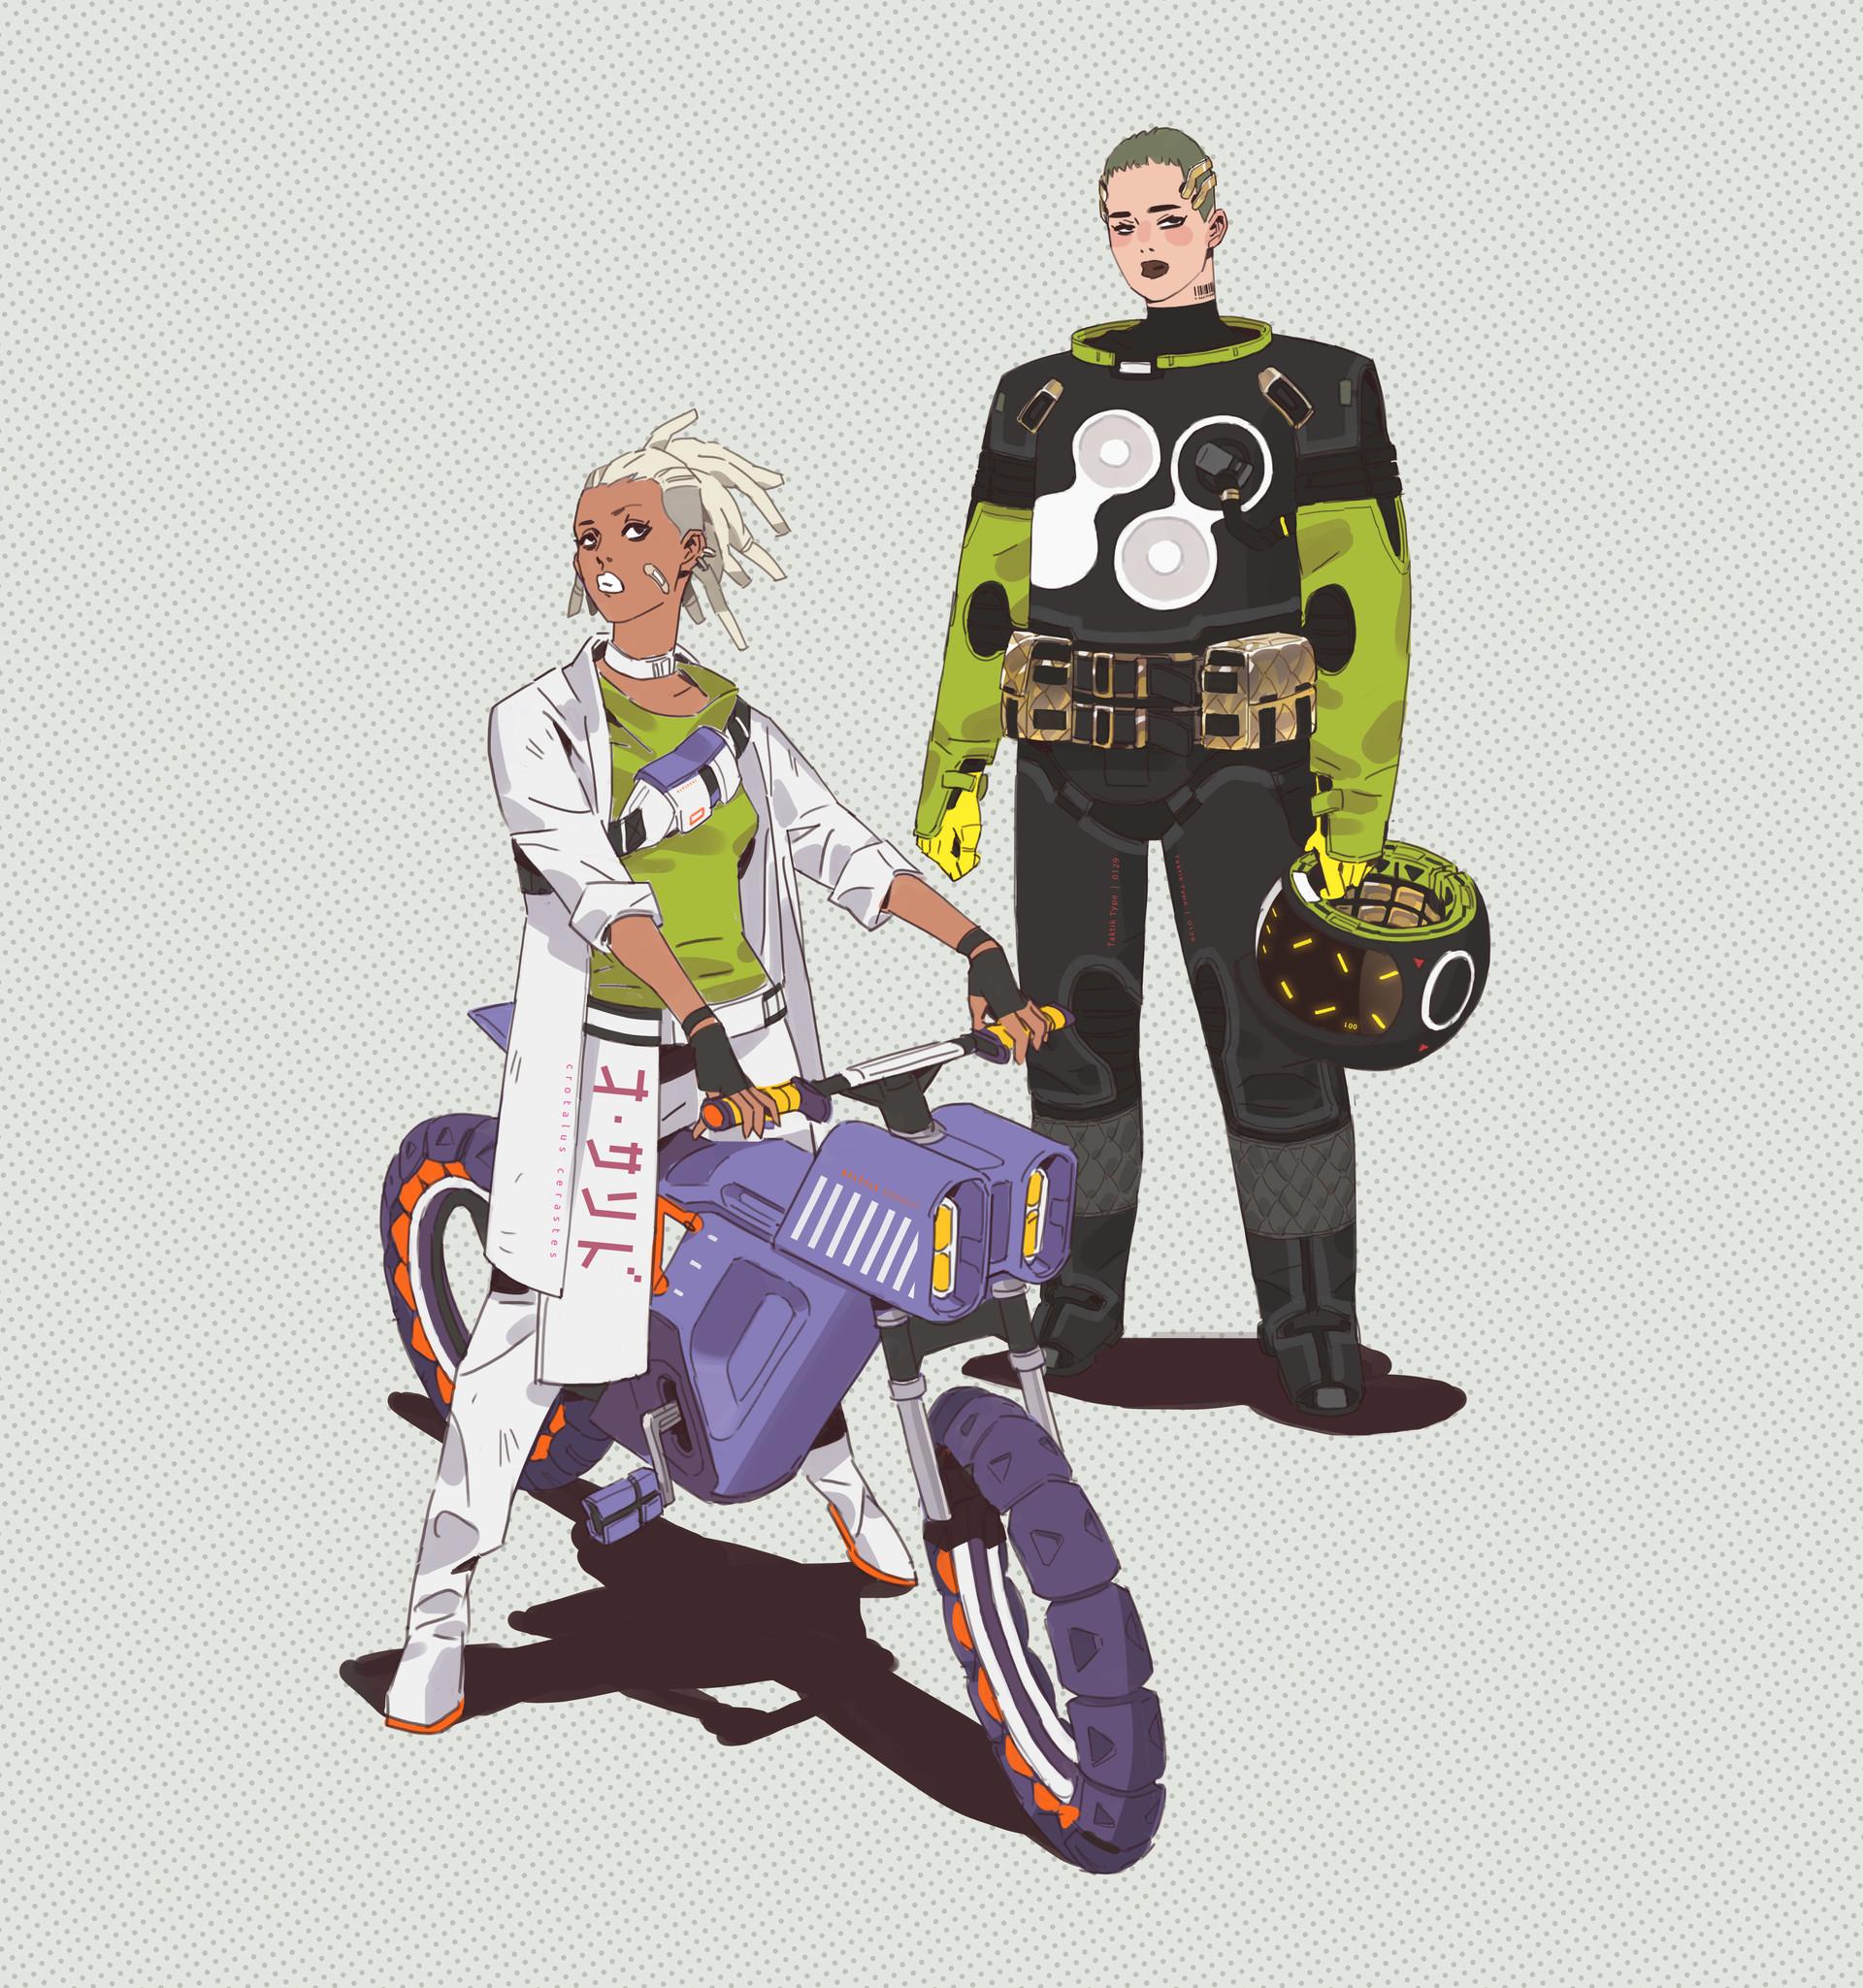 kejun-wang-12182018-biker.jpg